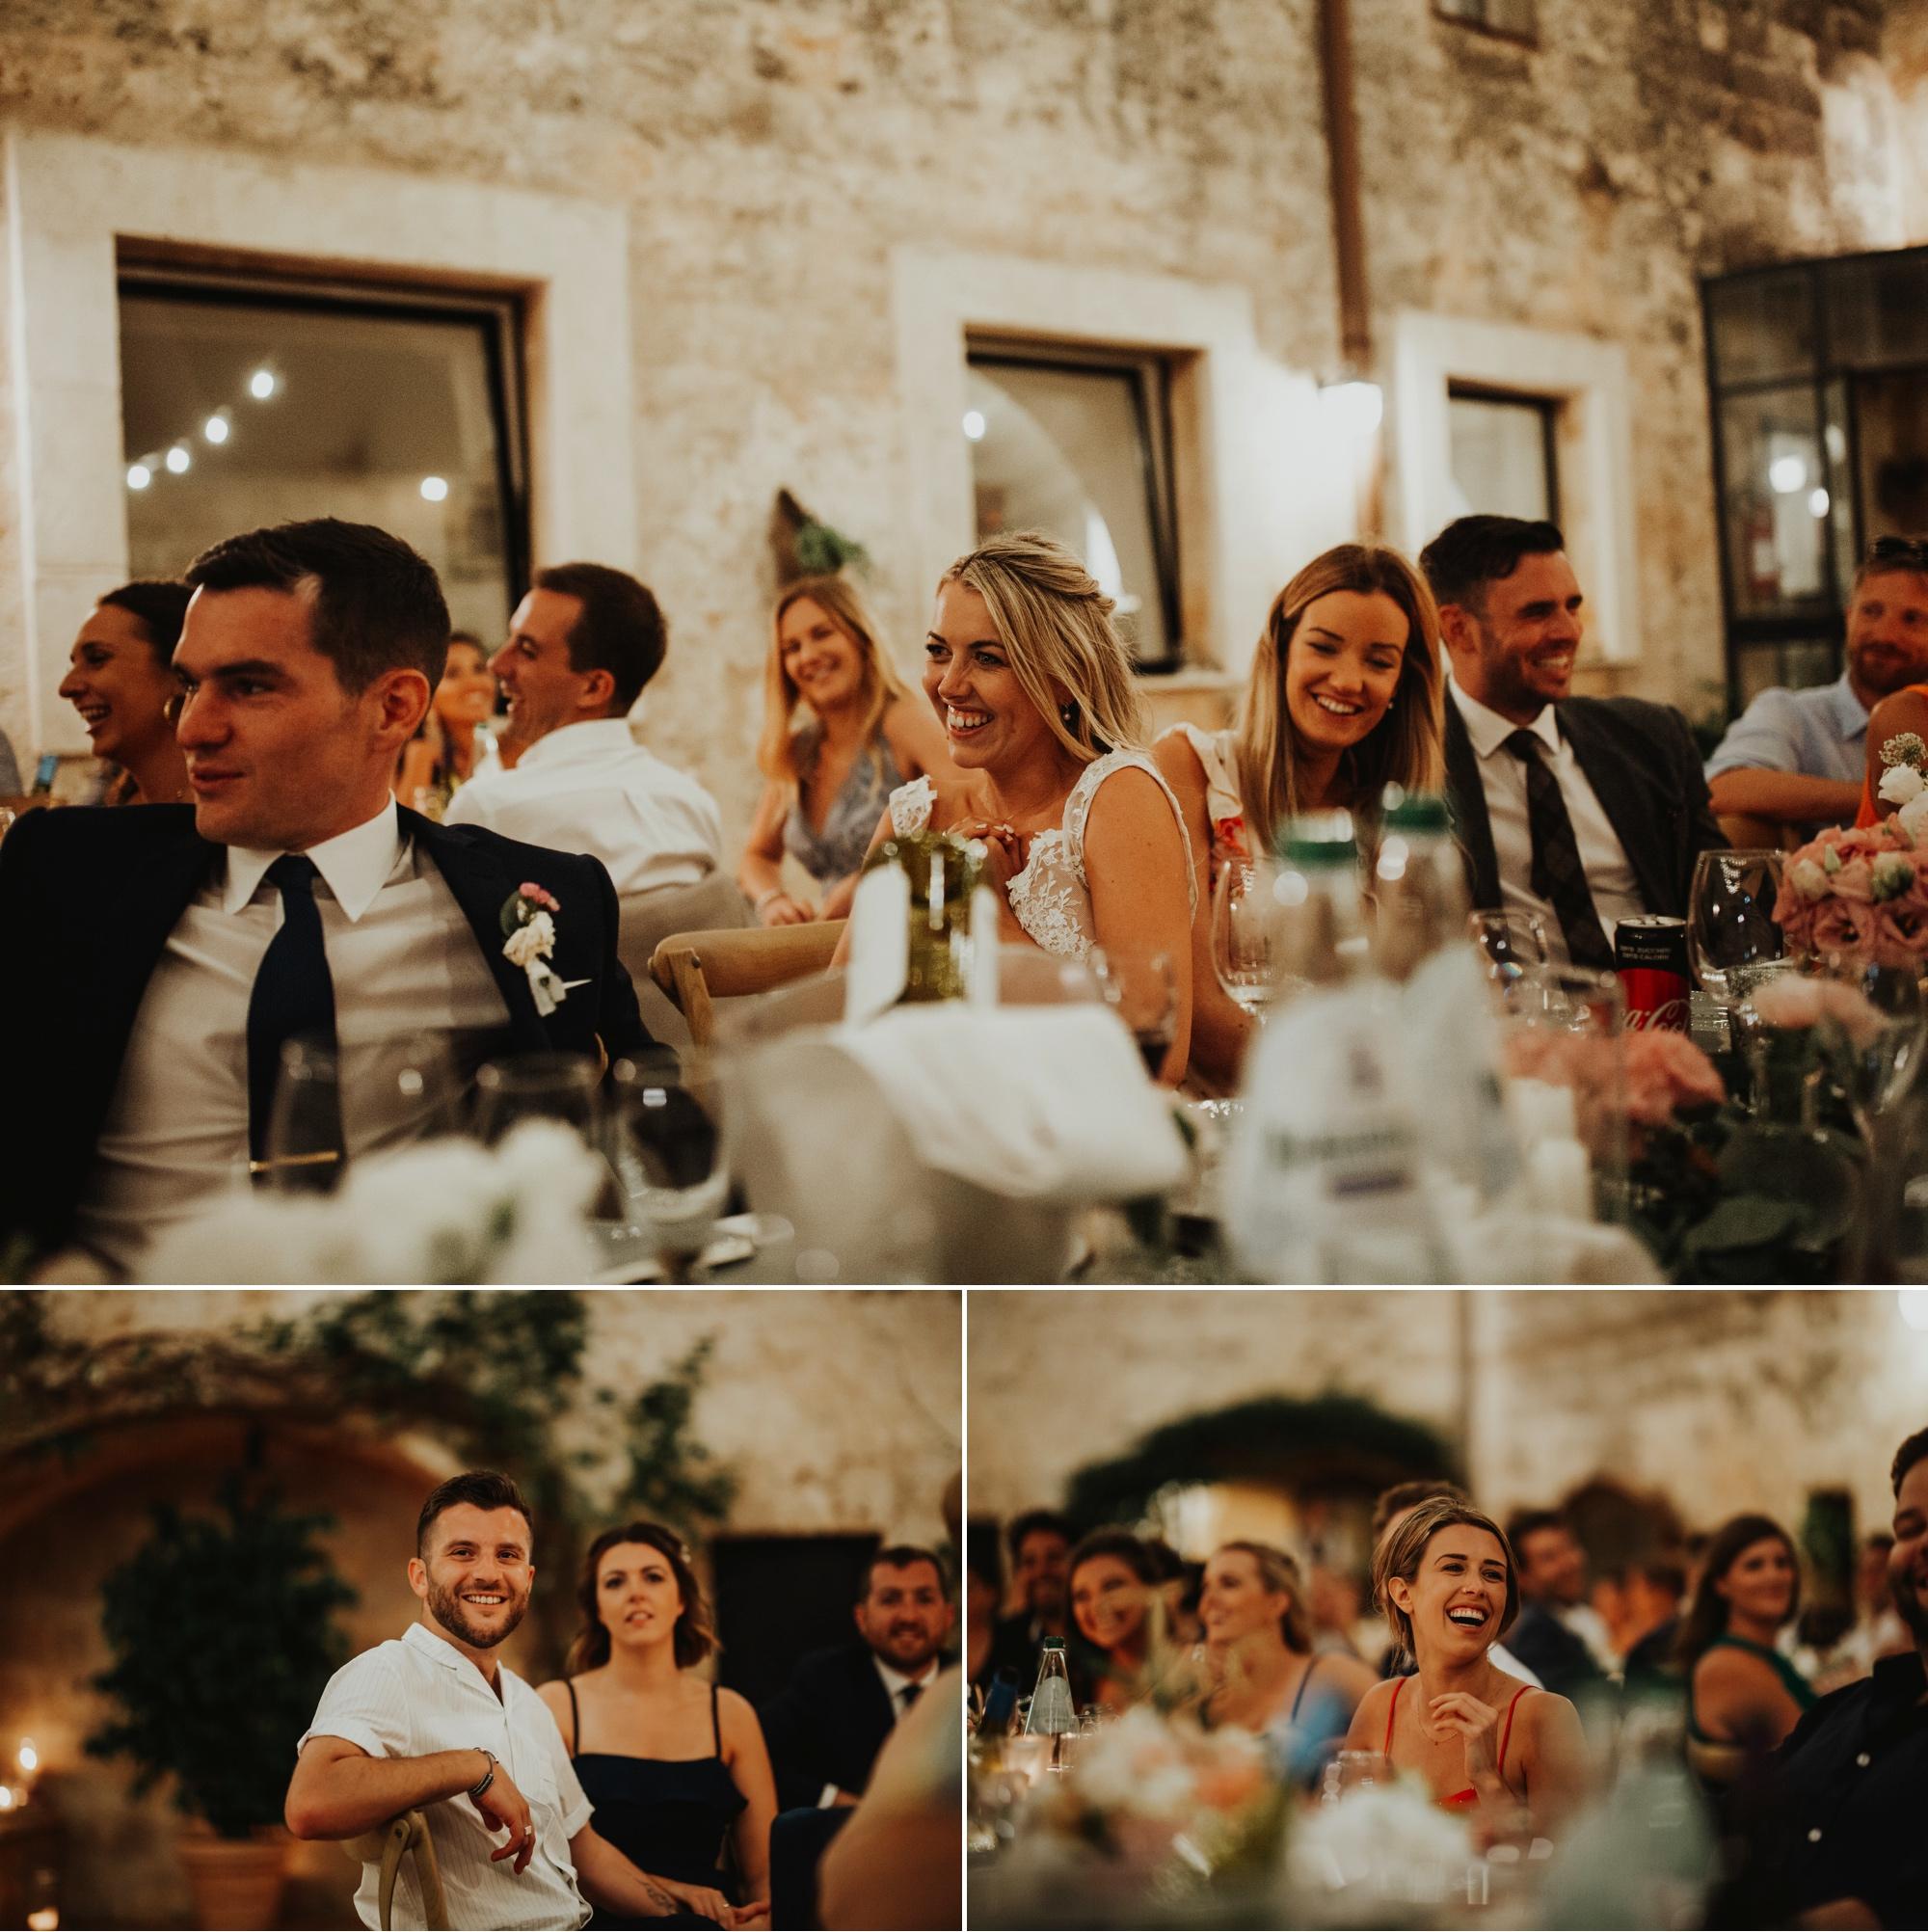 0000000075_Rob and Lucy-826_Rob and Lucy-843_Rob and Lucy-956_Italy_Just_Engaged_got_Destination_Weddings.jpg